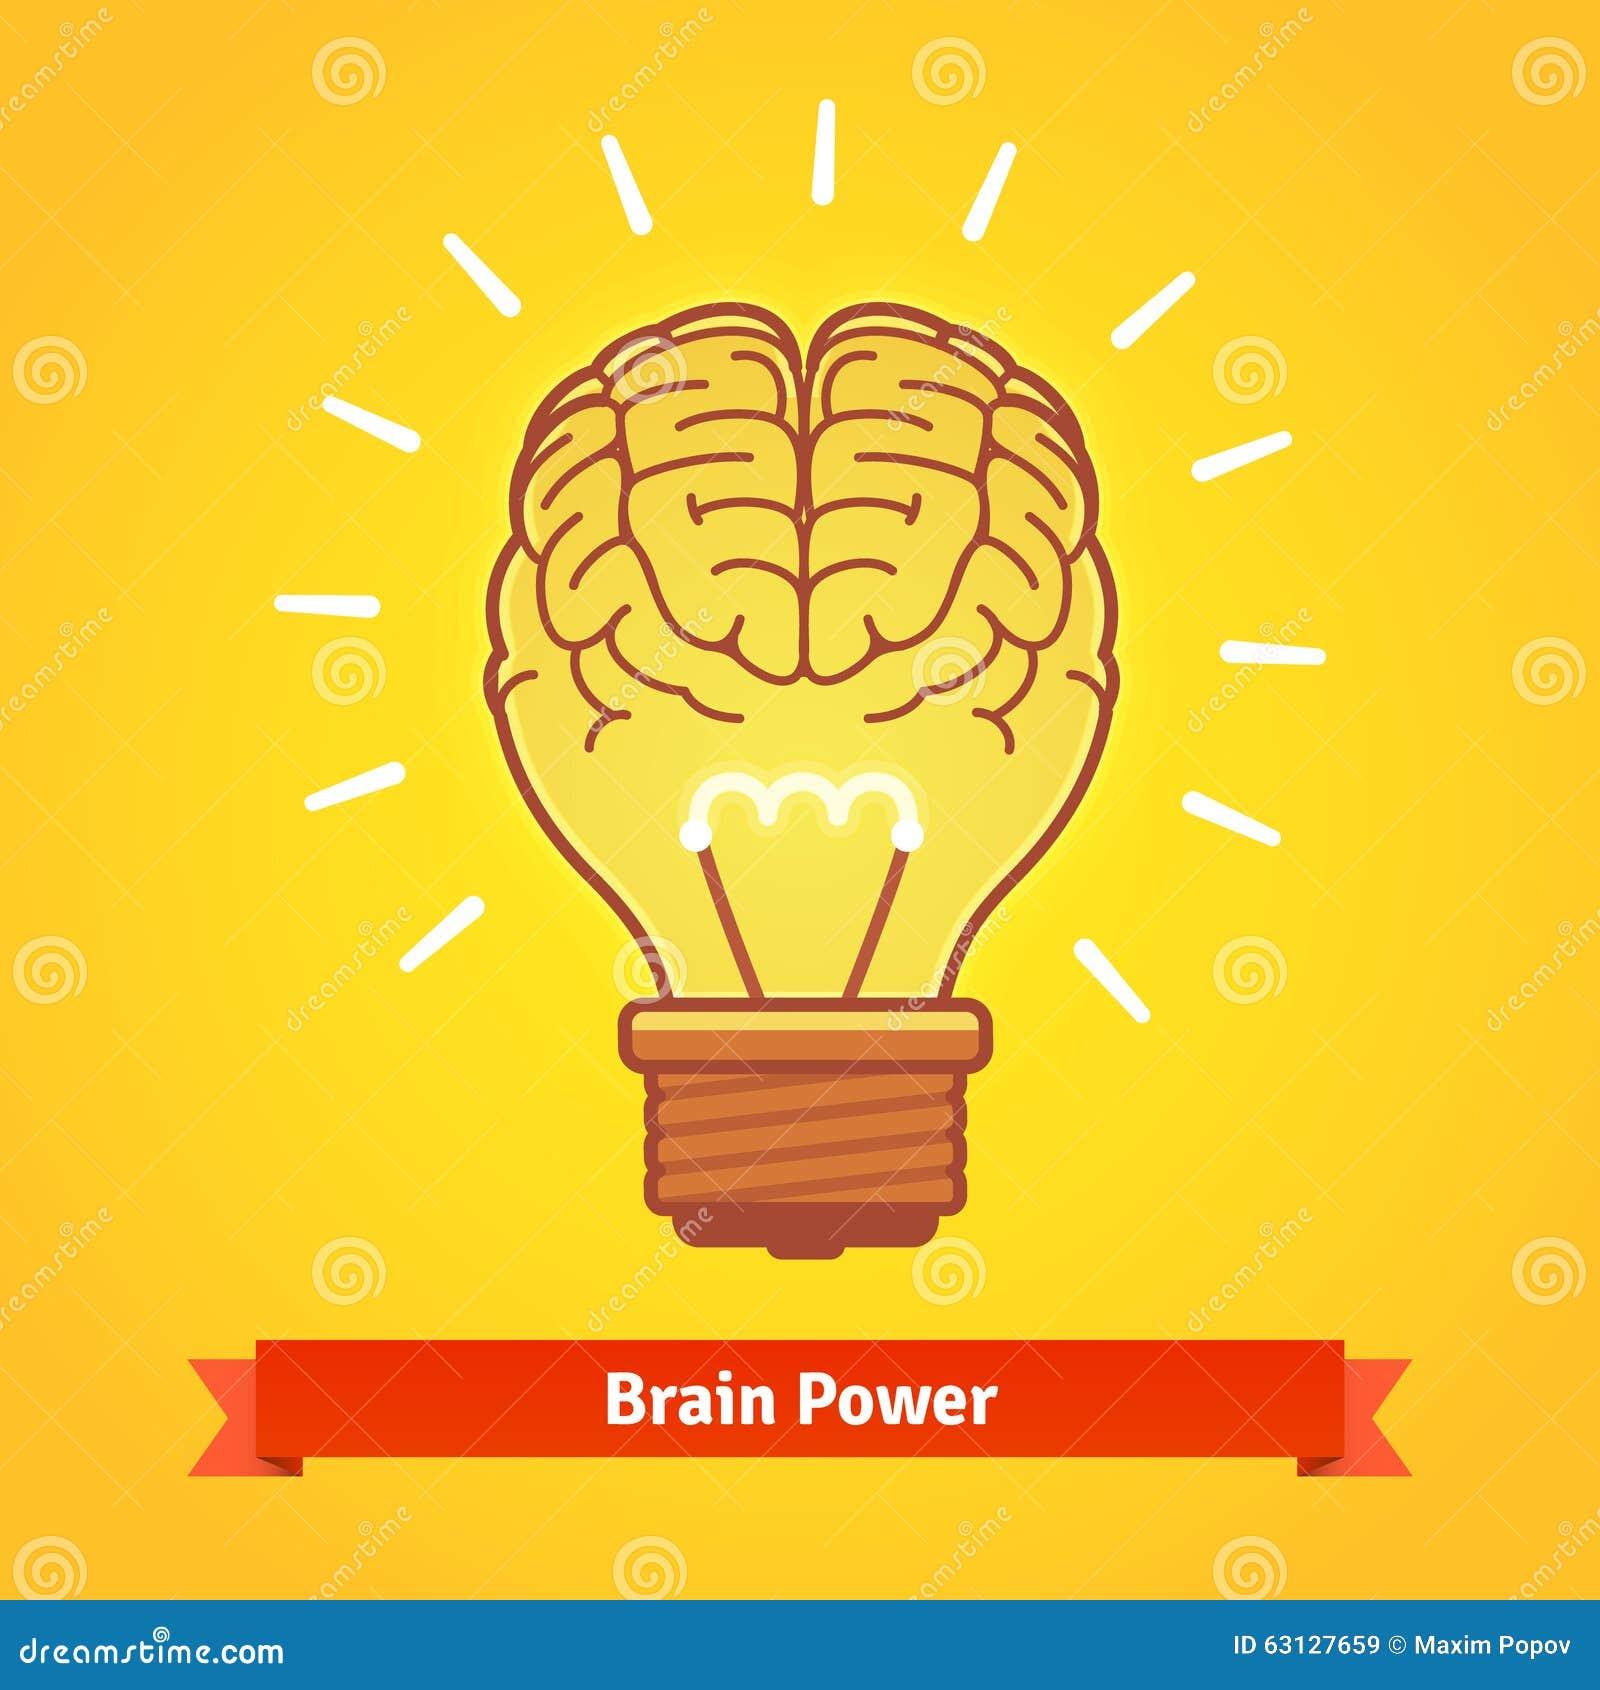 Brain Lights Up With Powerful Idea Like A Bulb Stock